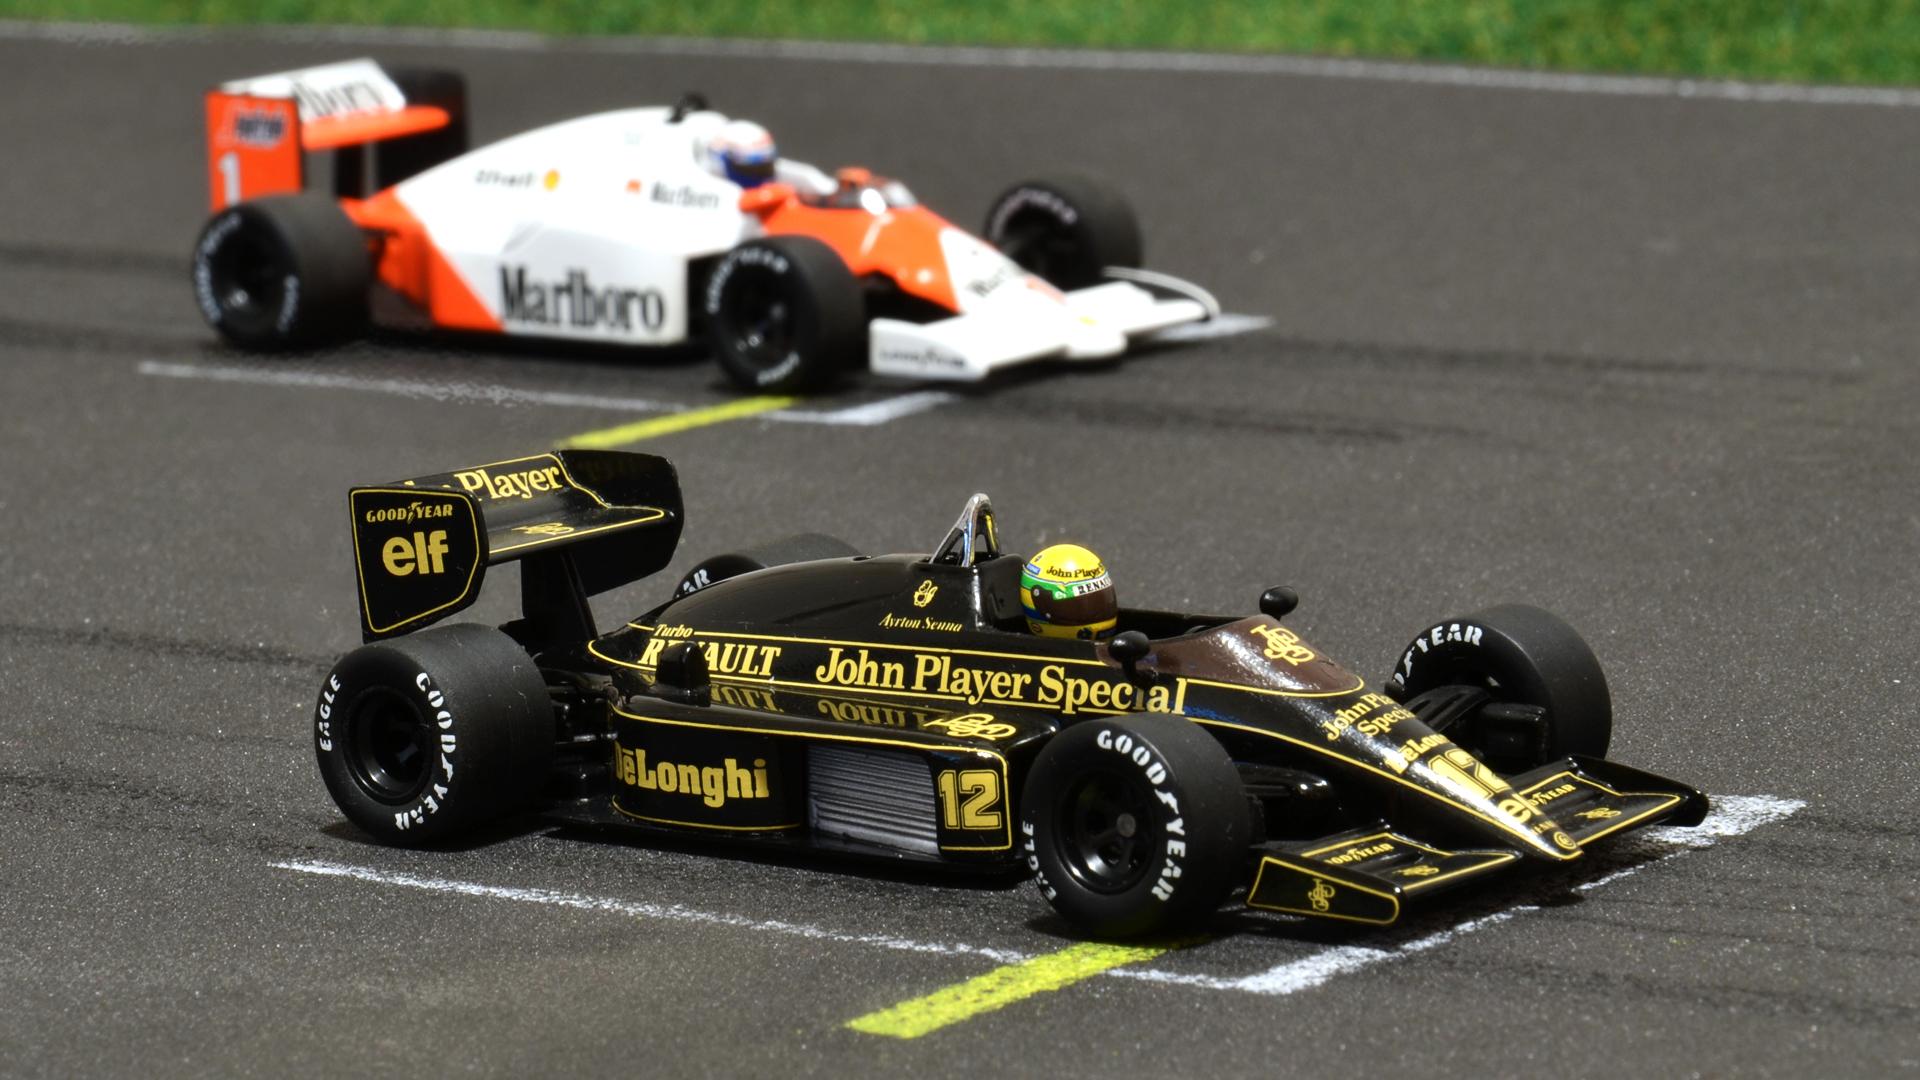 Lotus 98T és egy McLaren MP4/2C